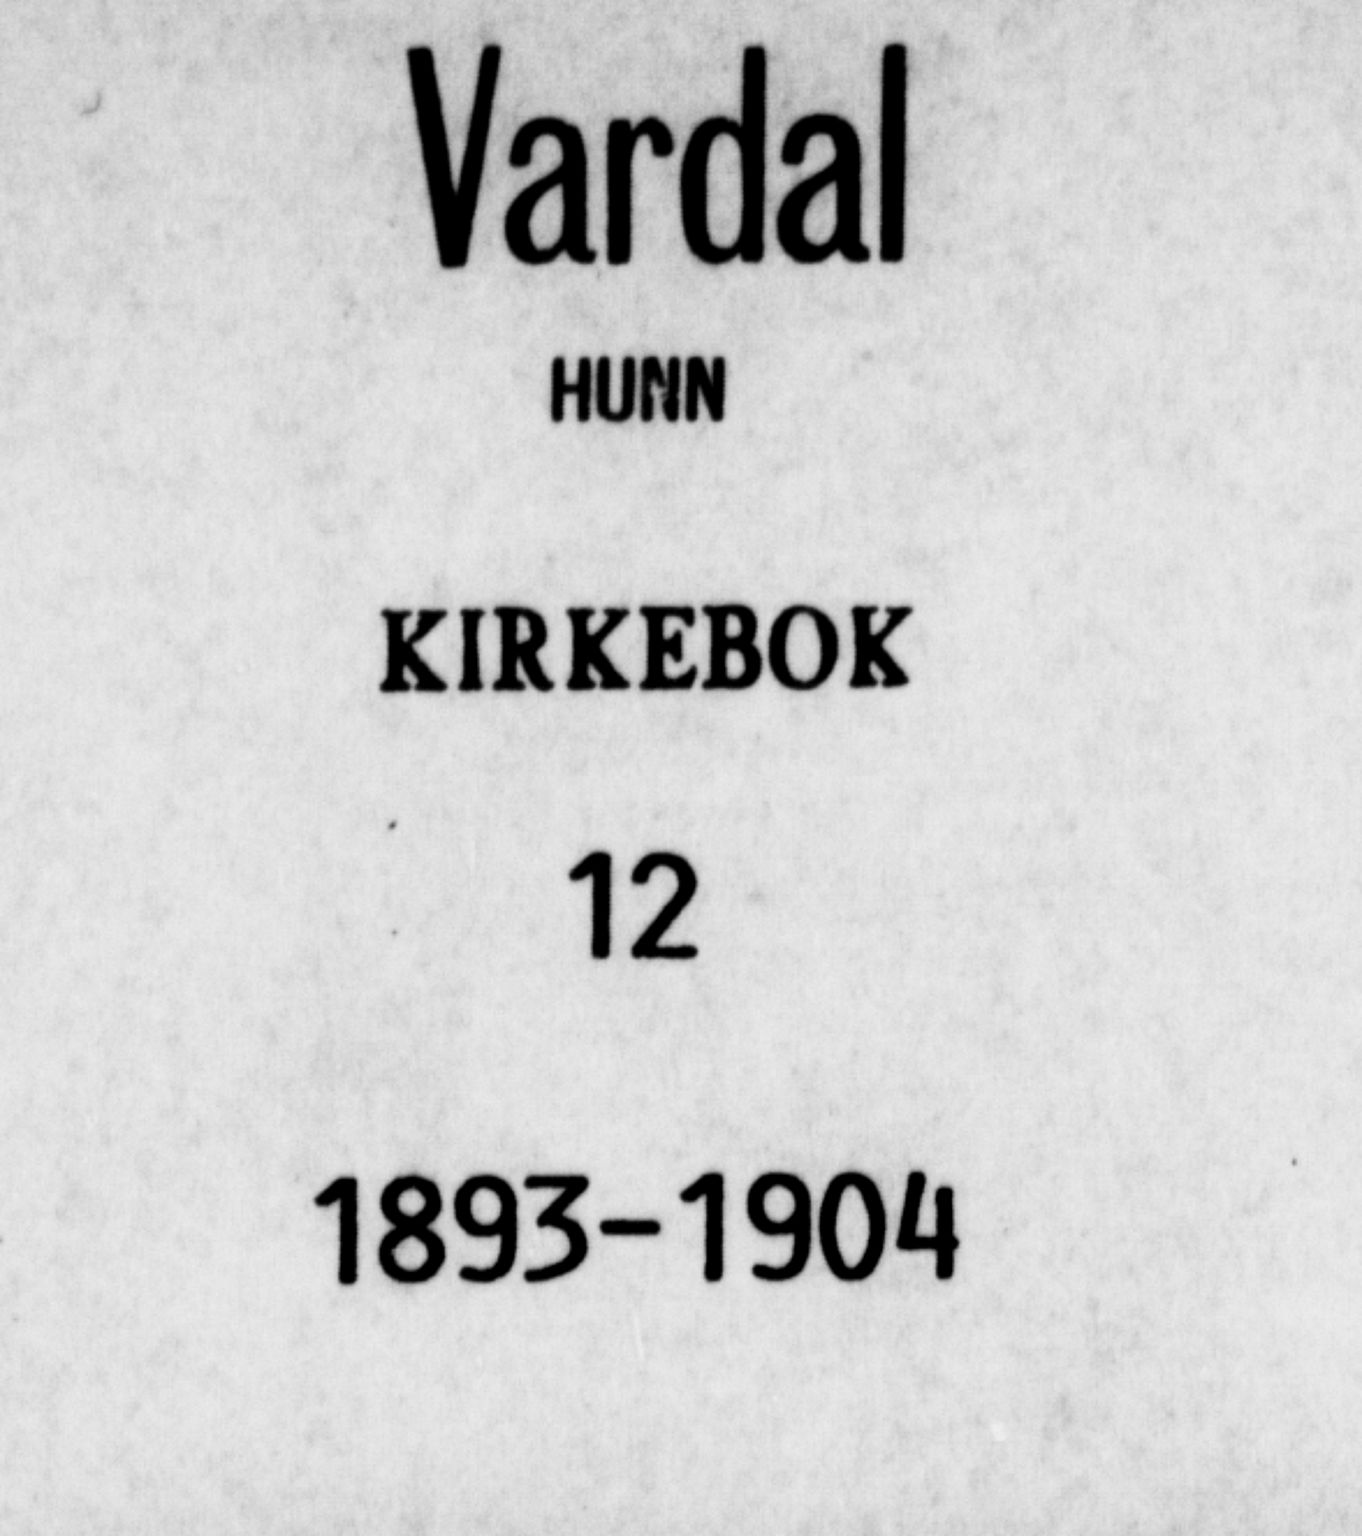 SAH, Vardal prestekontor, H/Ha/Haa/L0012: Ministerialbok nr. 12, 1893-1904